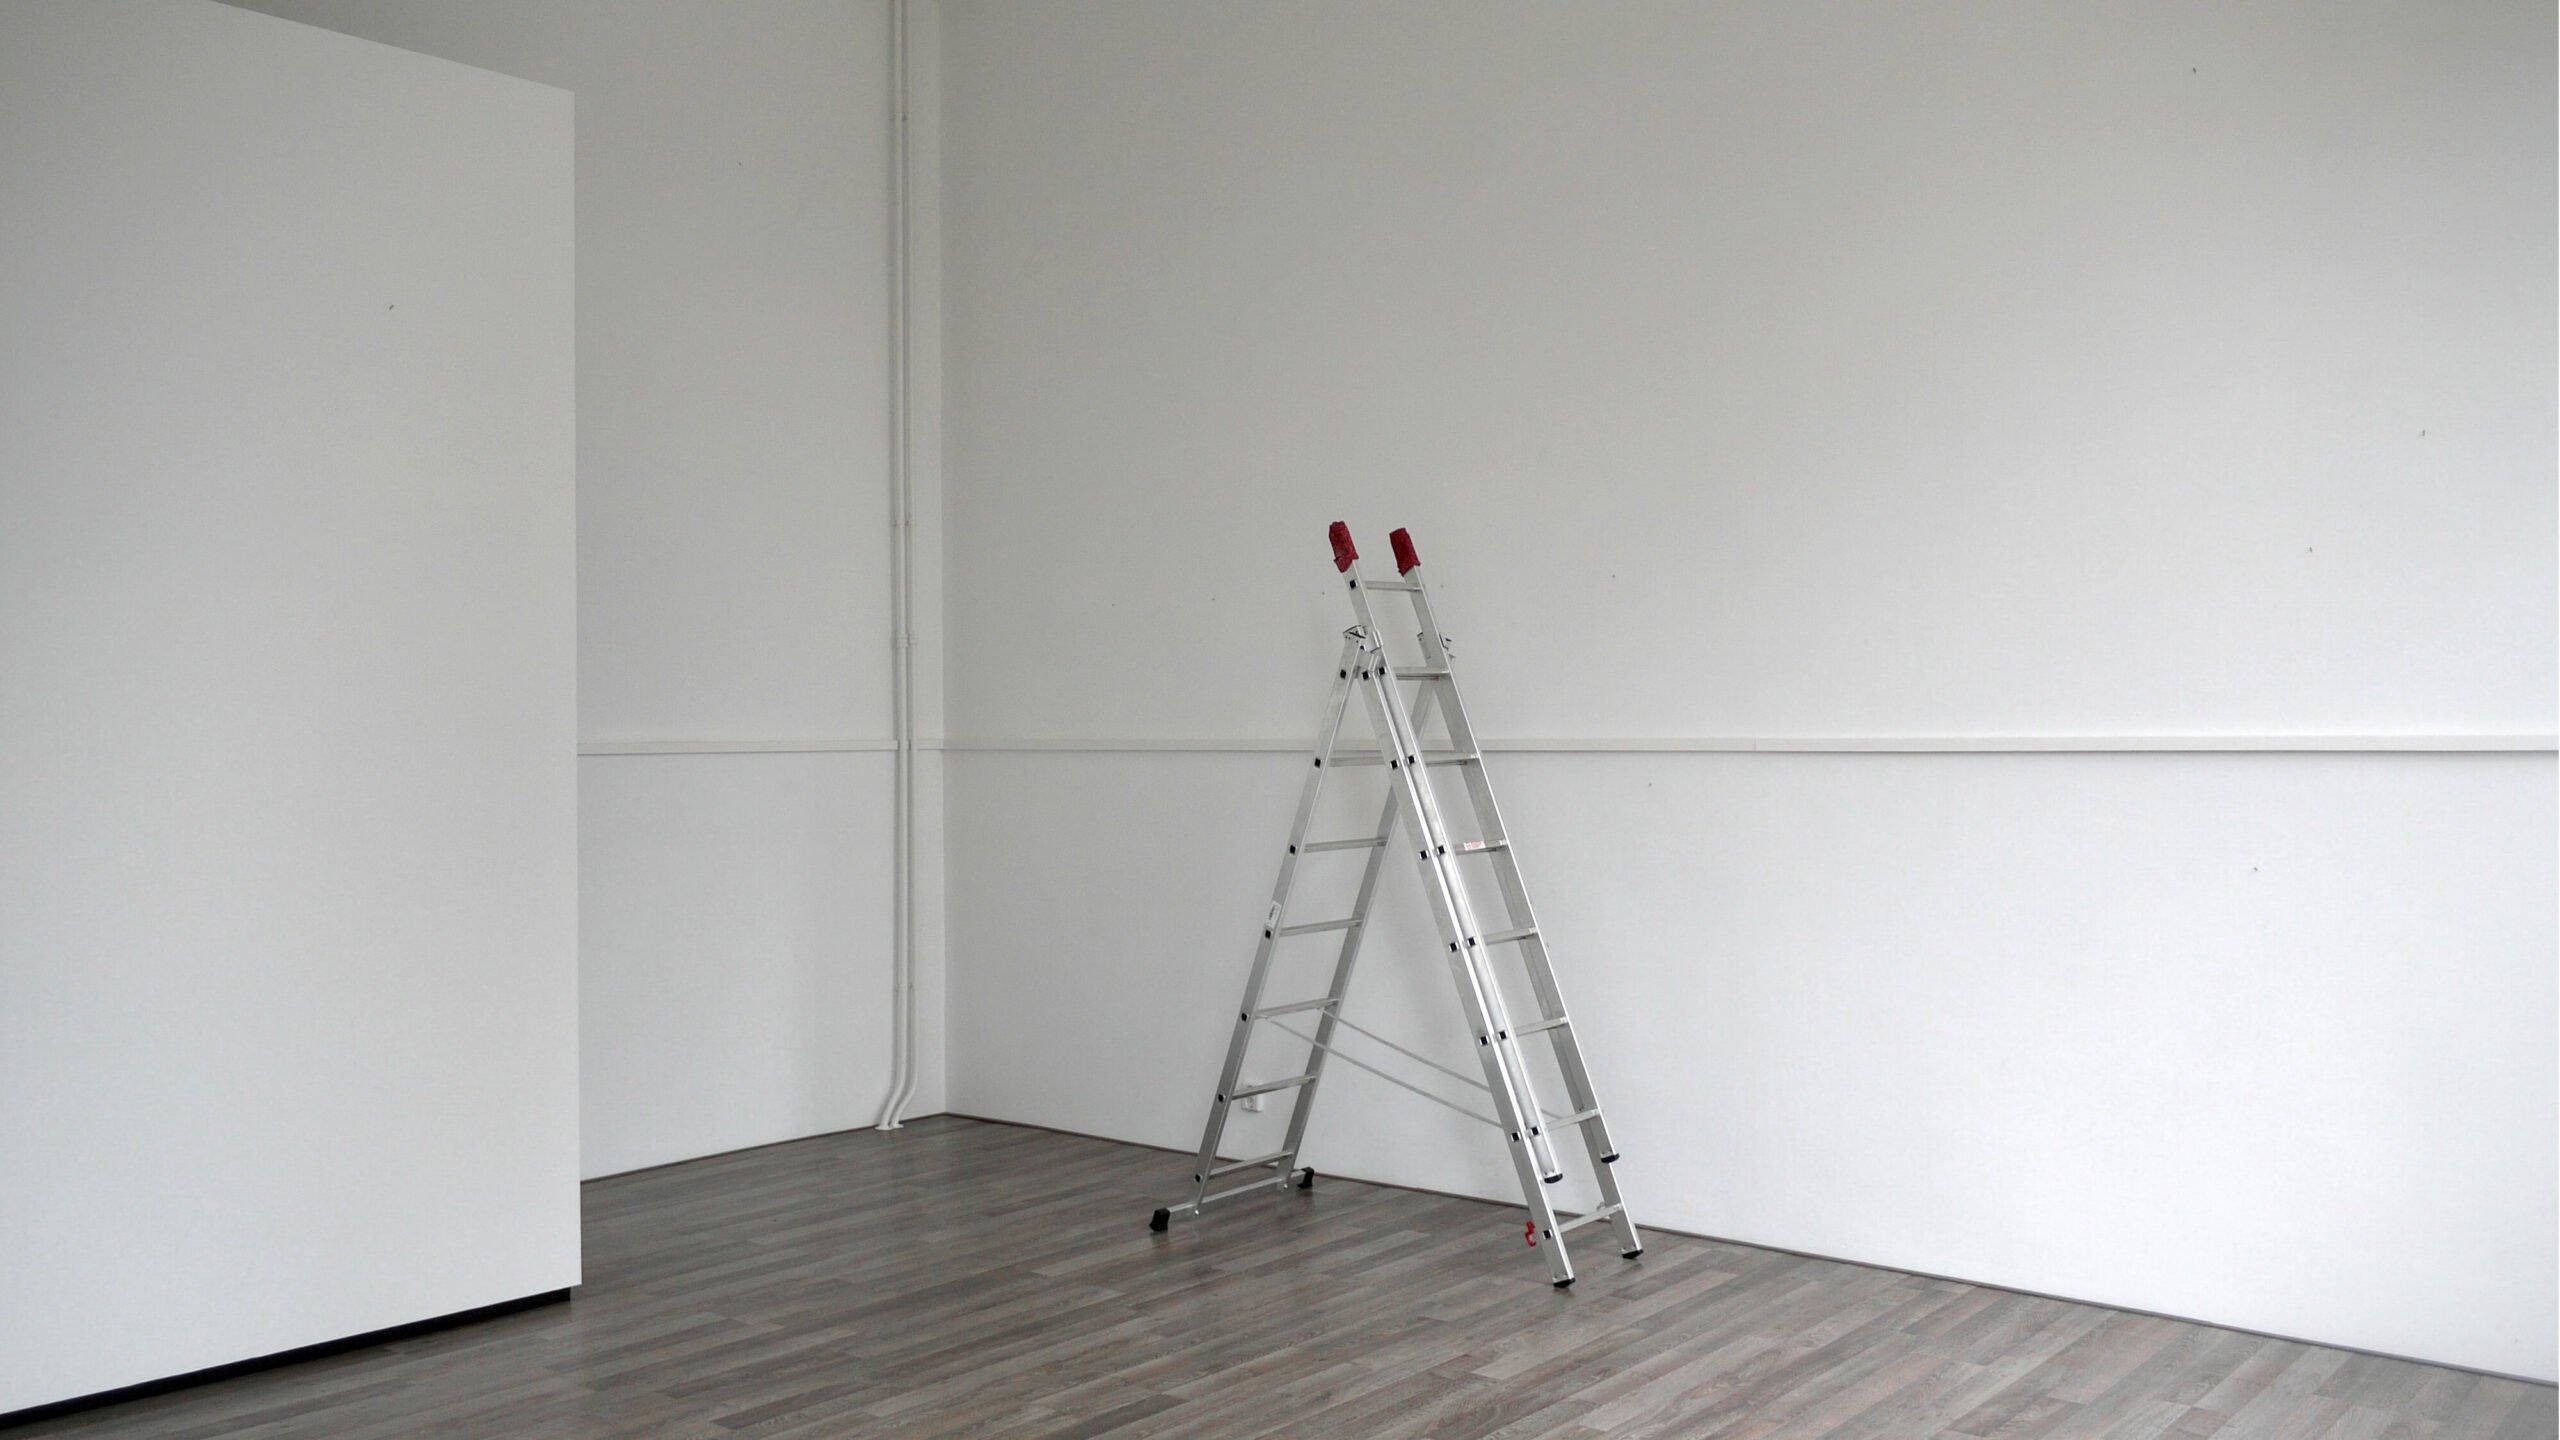 Kunstlokaal No8 tentoonstellingen hedendaagse kunst